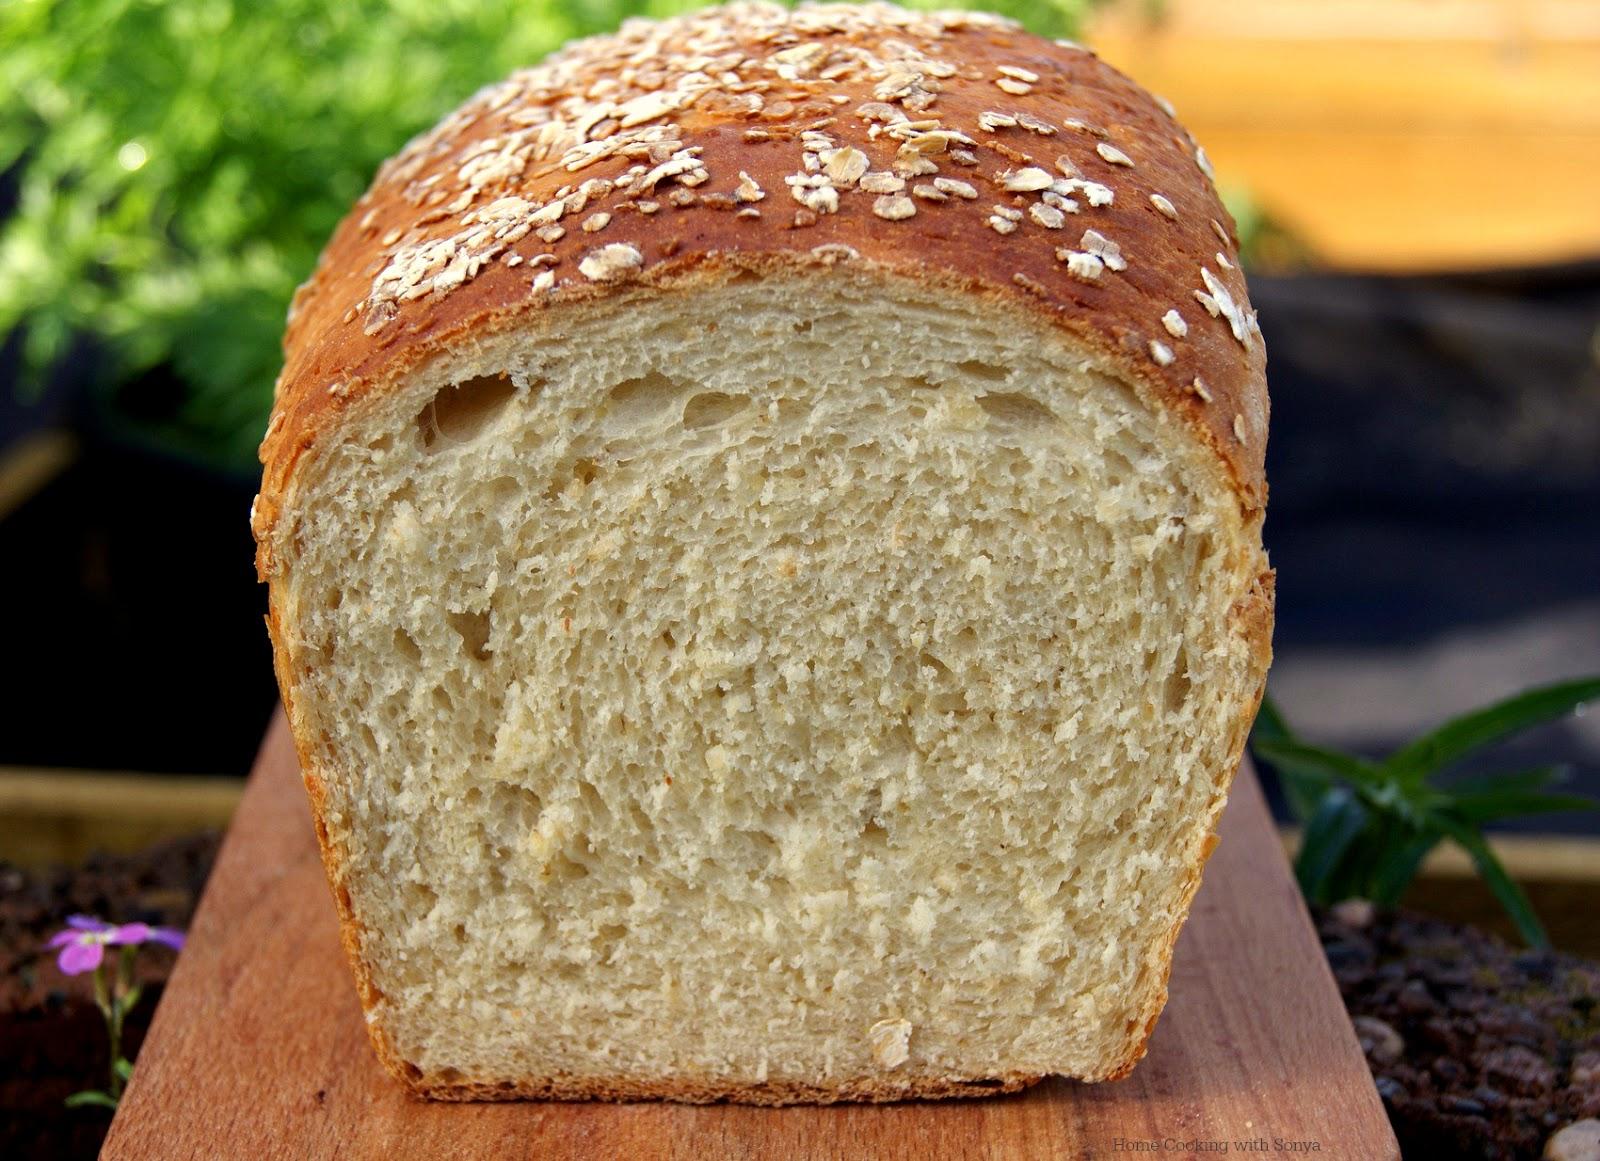 Buttermilk honey oat bread recipes - buttermilk honey oat bread recipe